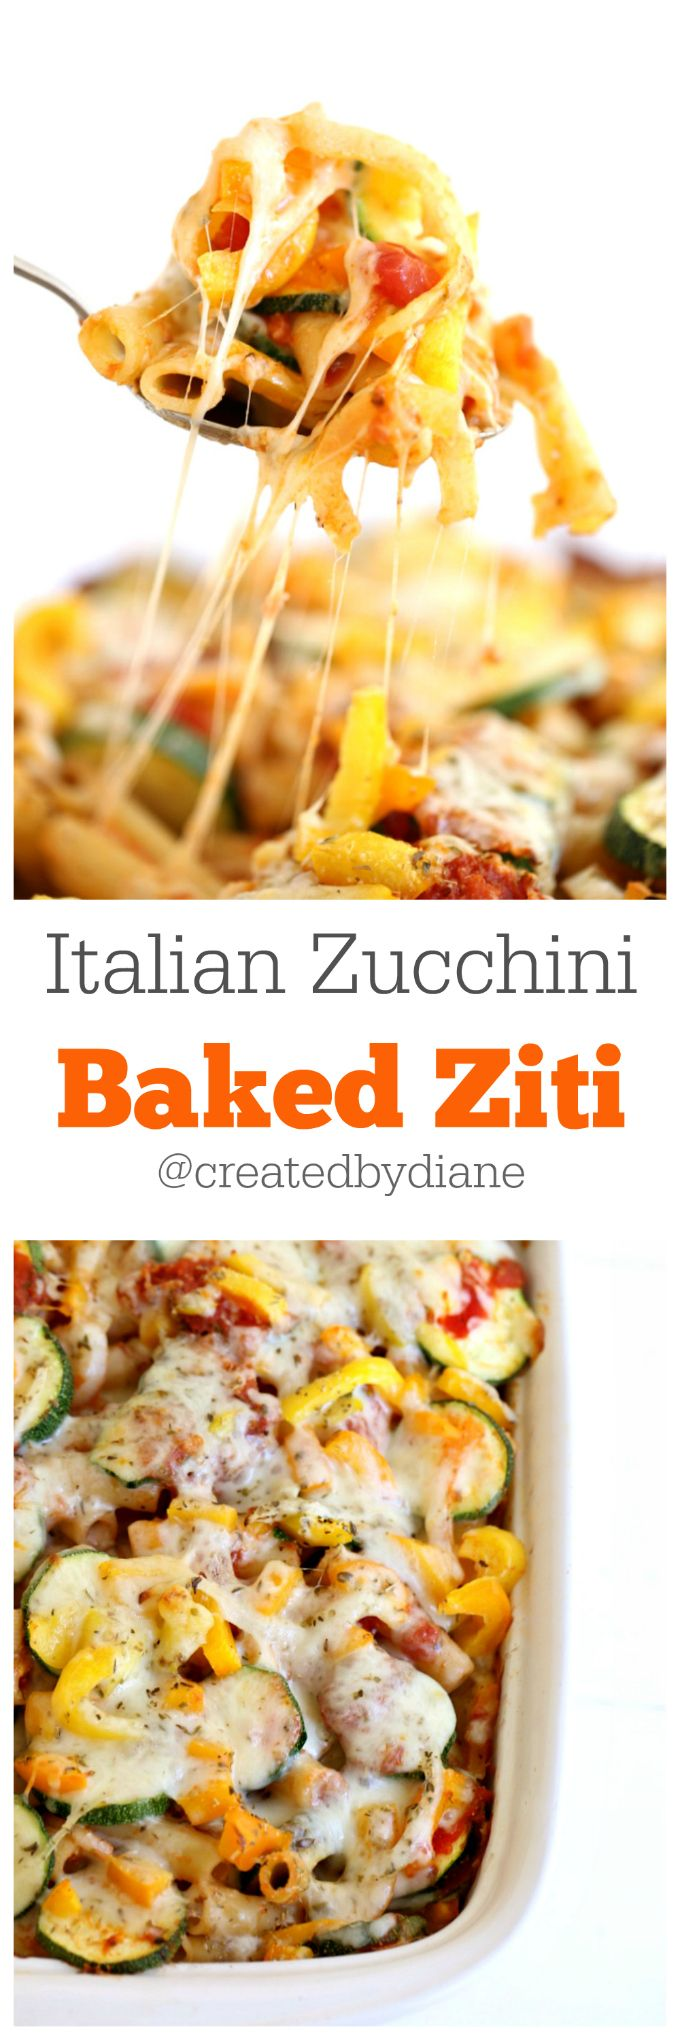 Italian Zucchini Baked Ziti recipe @createdbydiane